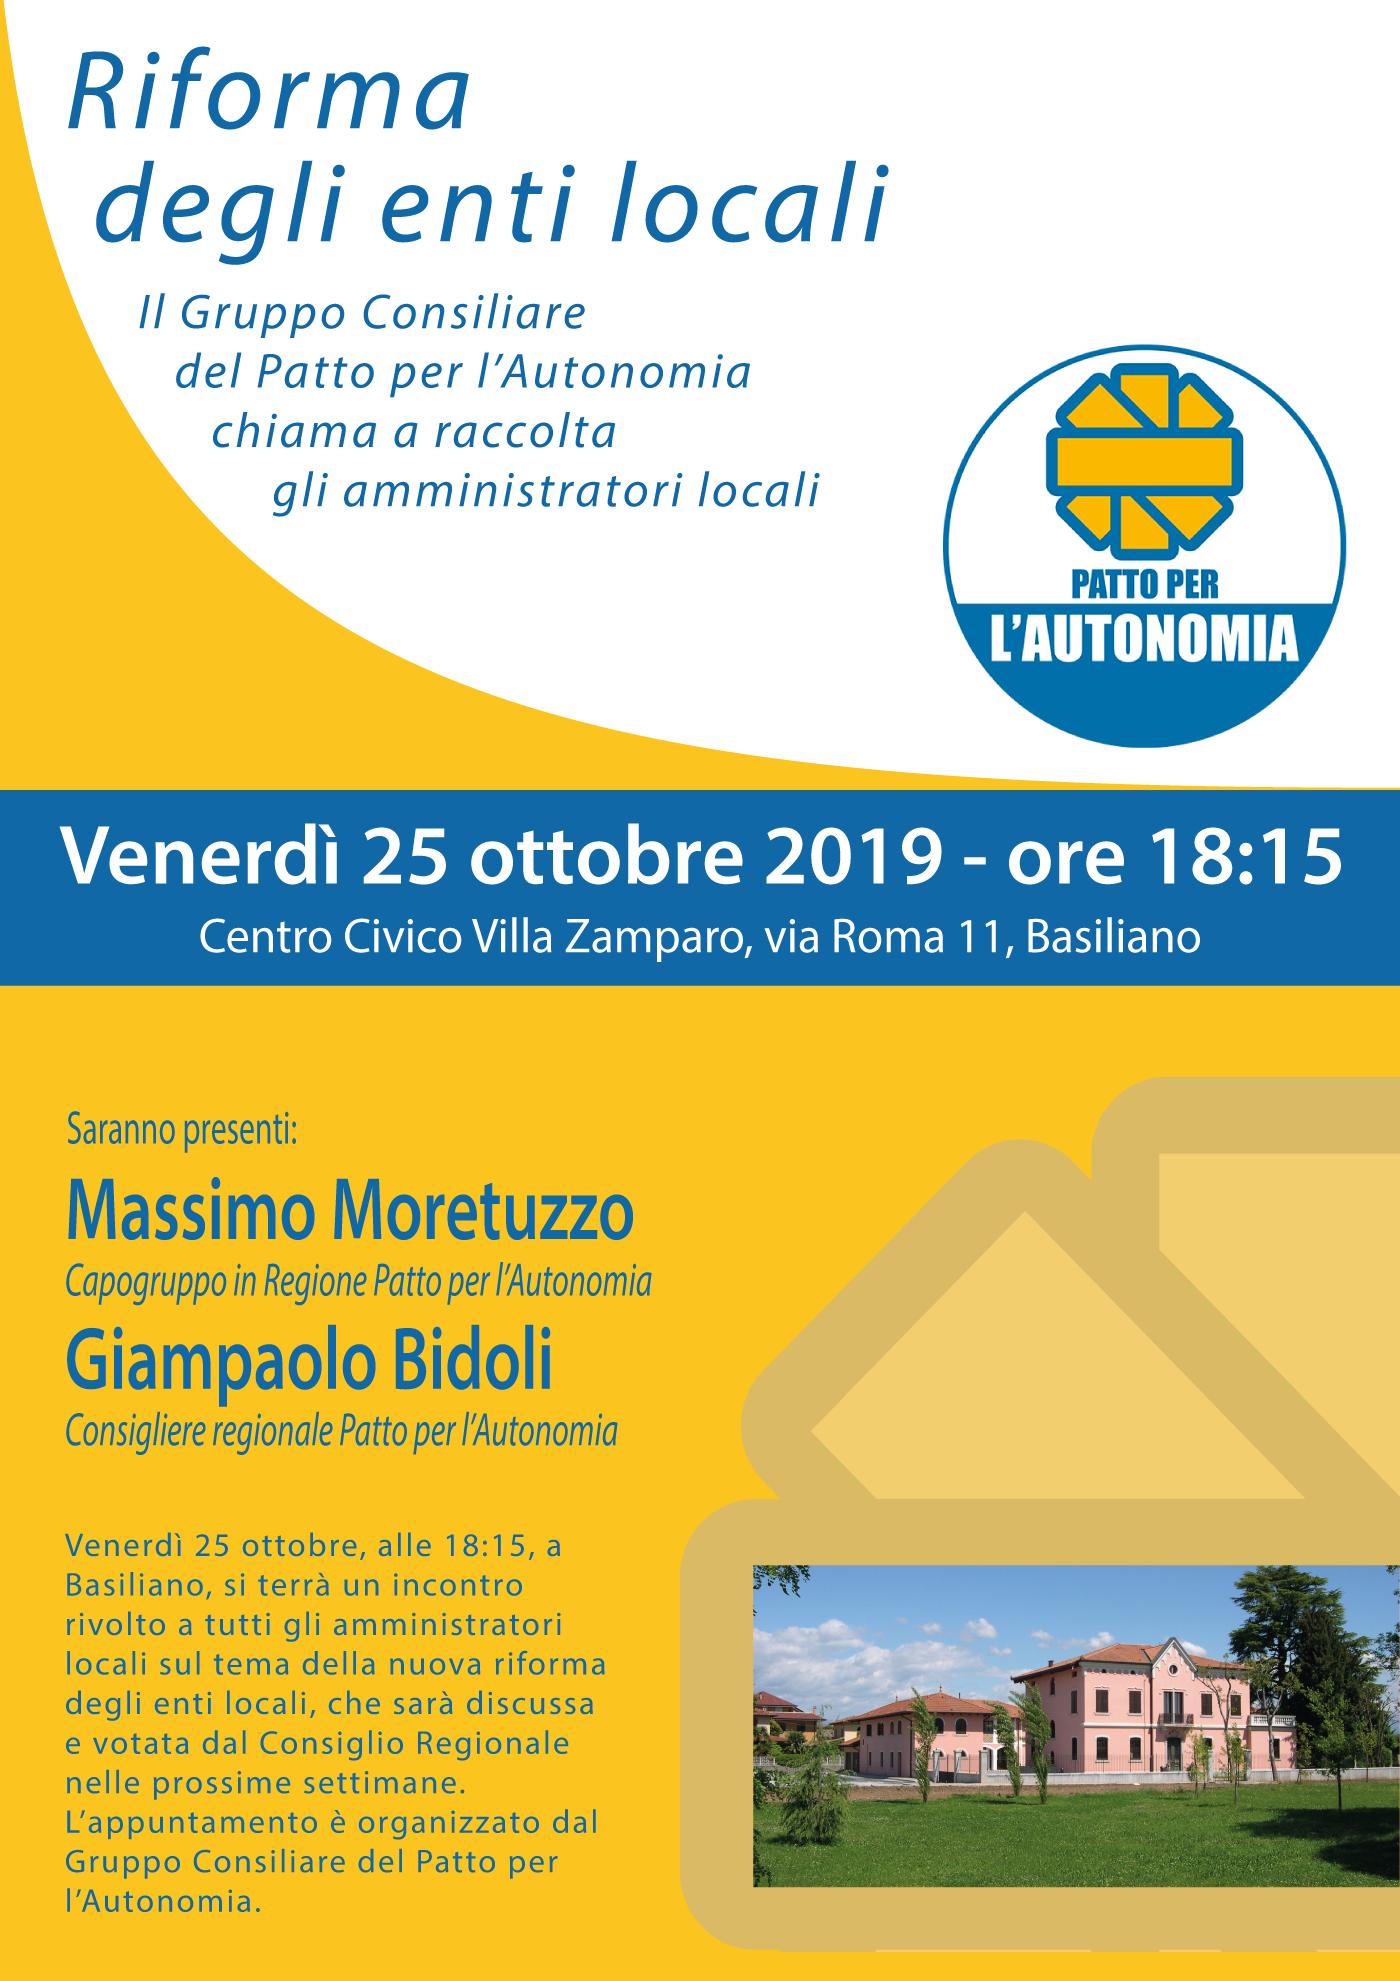 Volantino-basiliano-25-10-2019-A4.png